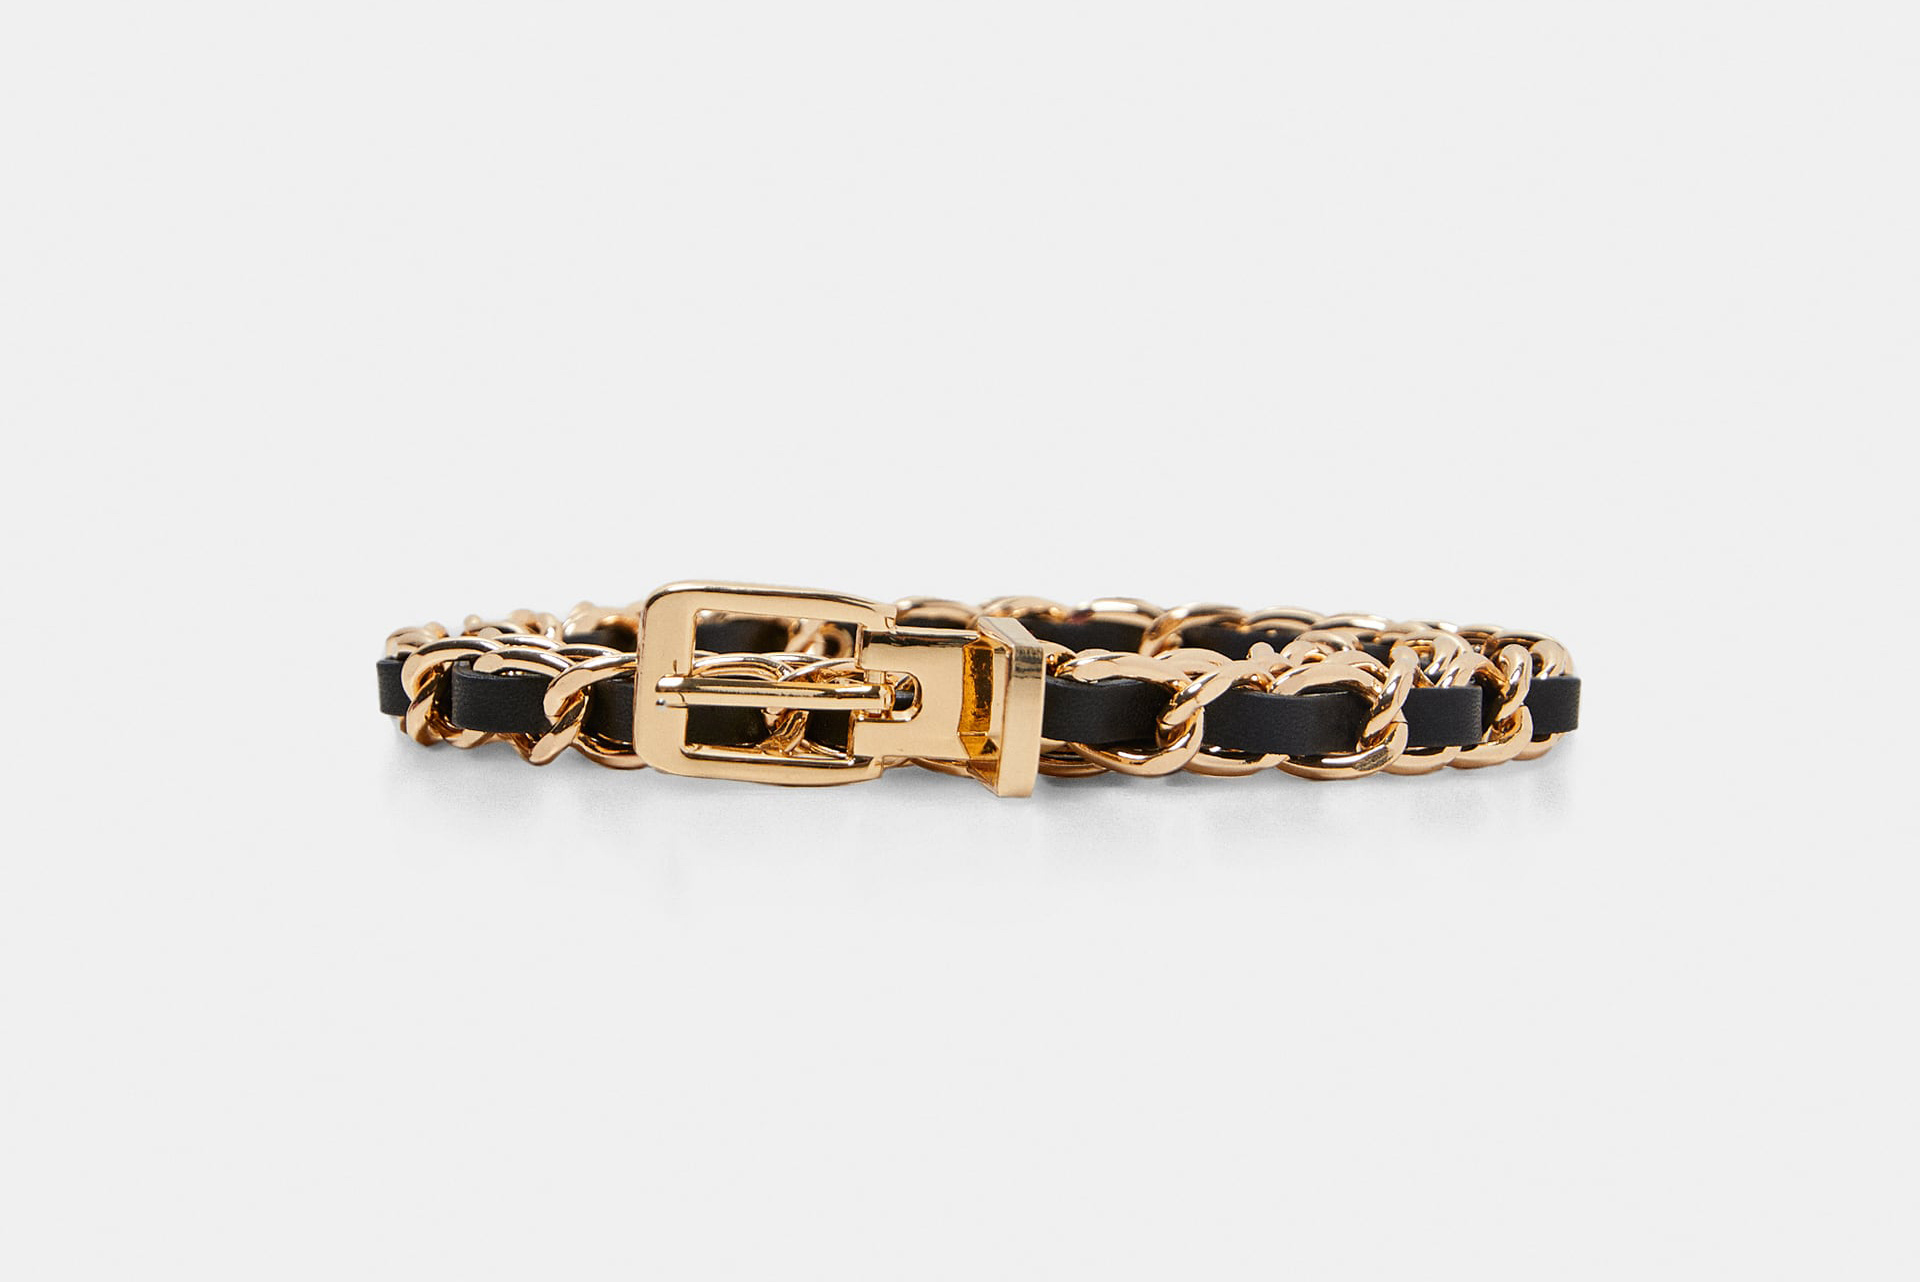 A Chain Belt